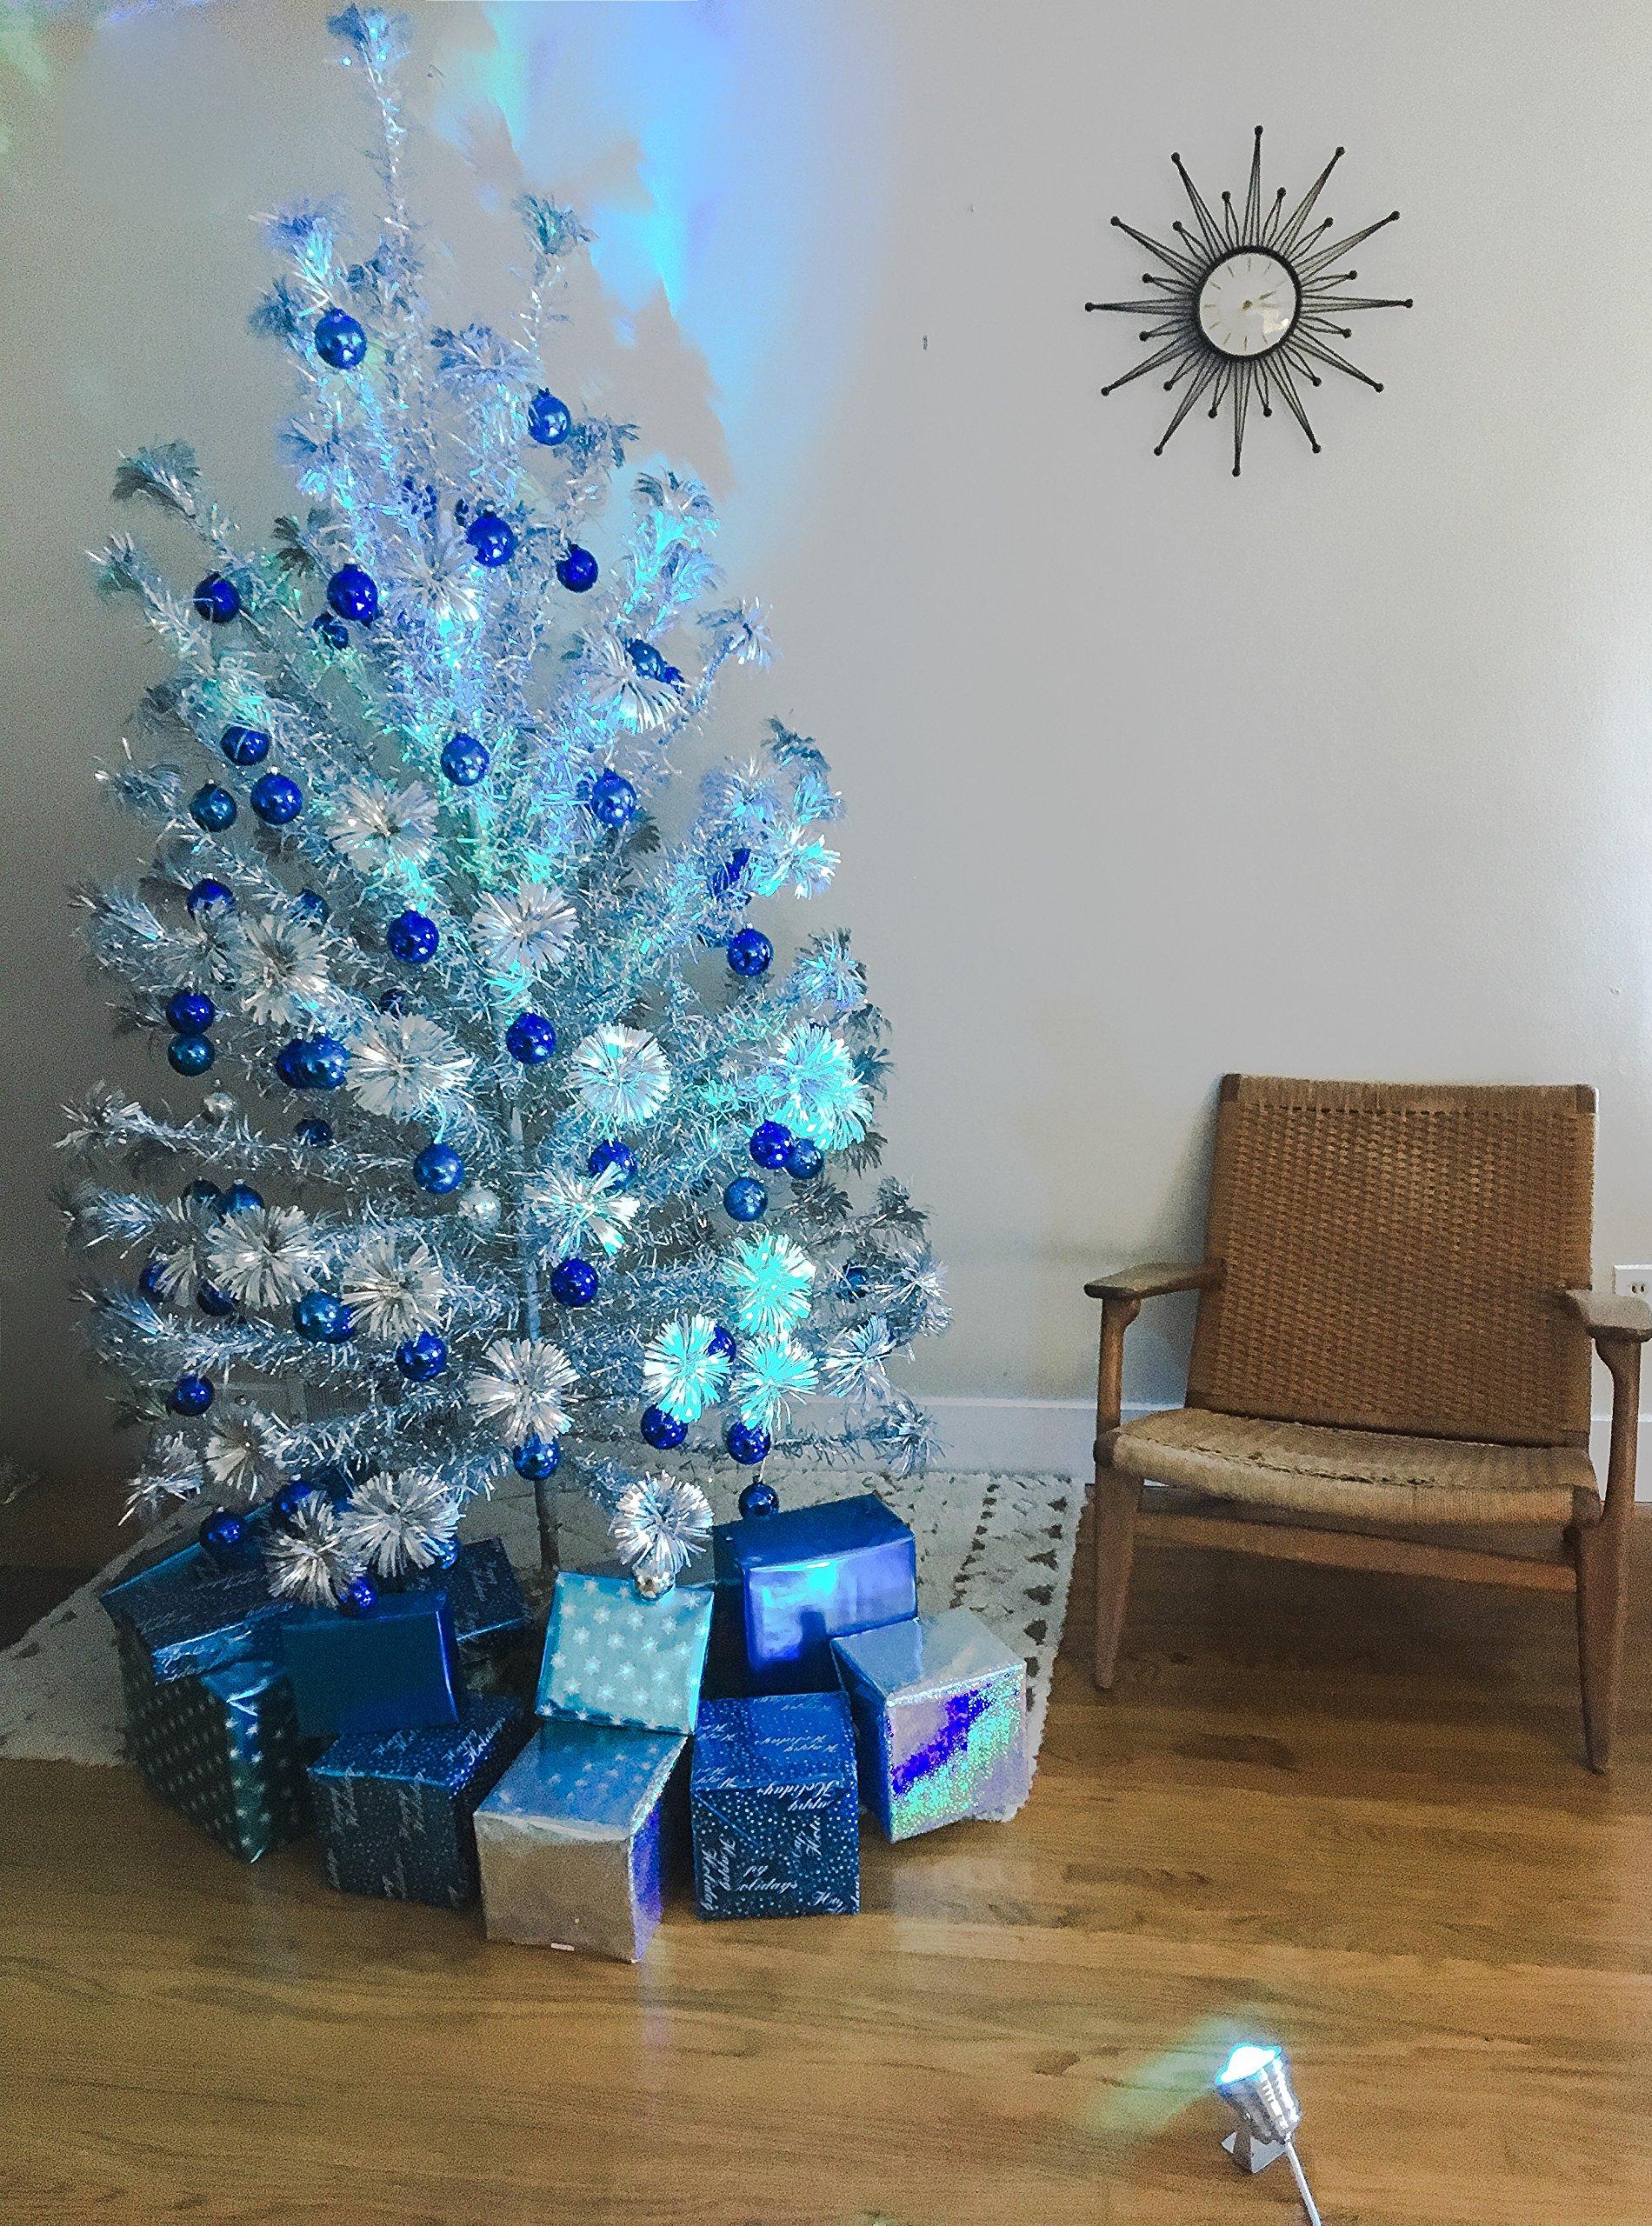 TreeTronics Color Wheel 2.0 – For Vintage Aluminum Christmas Tree - Mid Century Modern – Artificial Retro, MCM XMAS (Silver) by Color Wheel 2.0